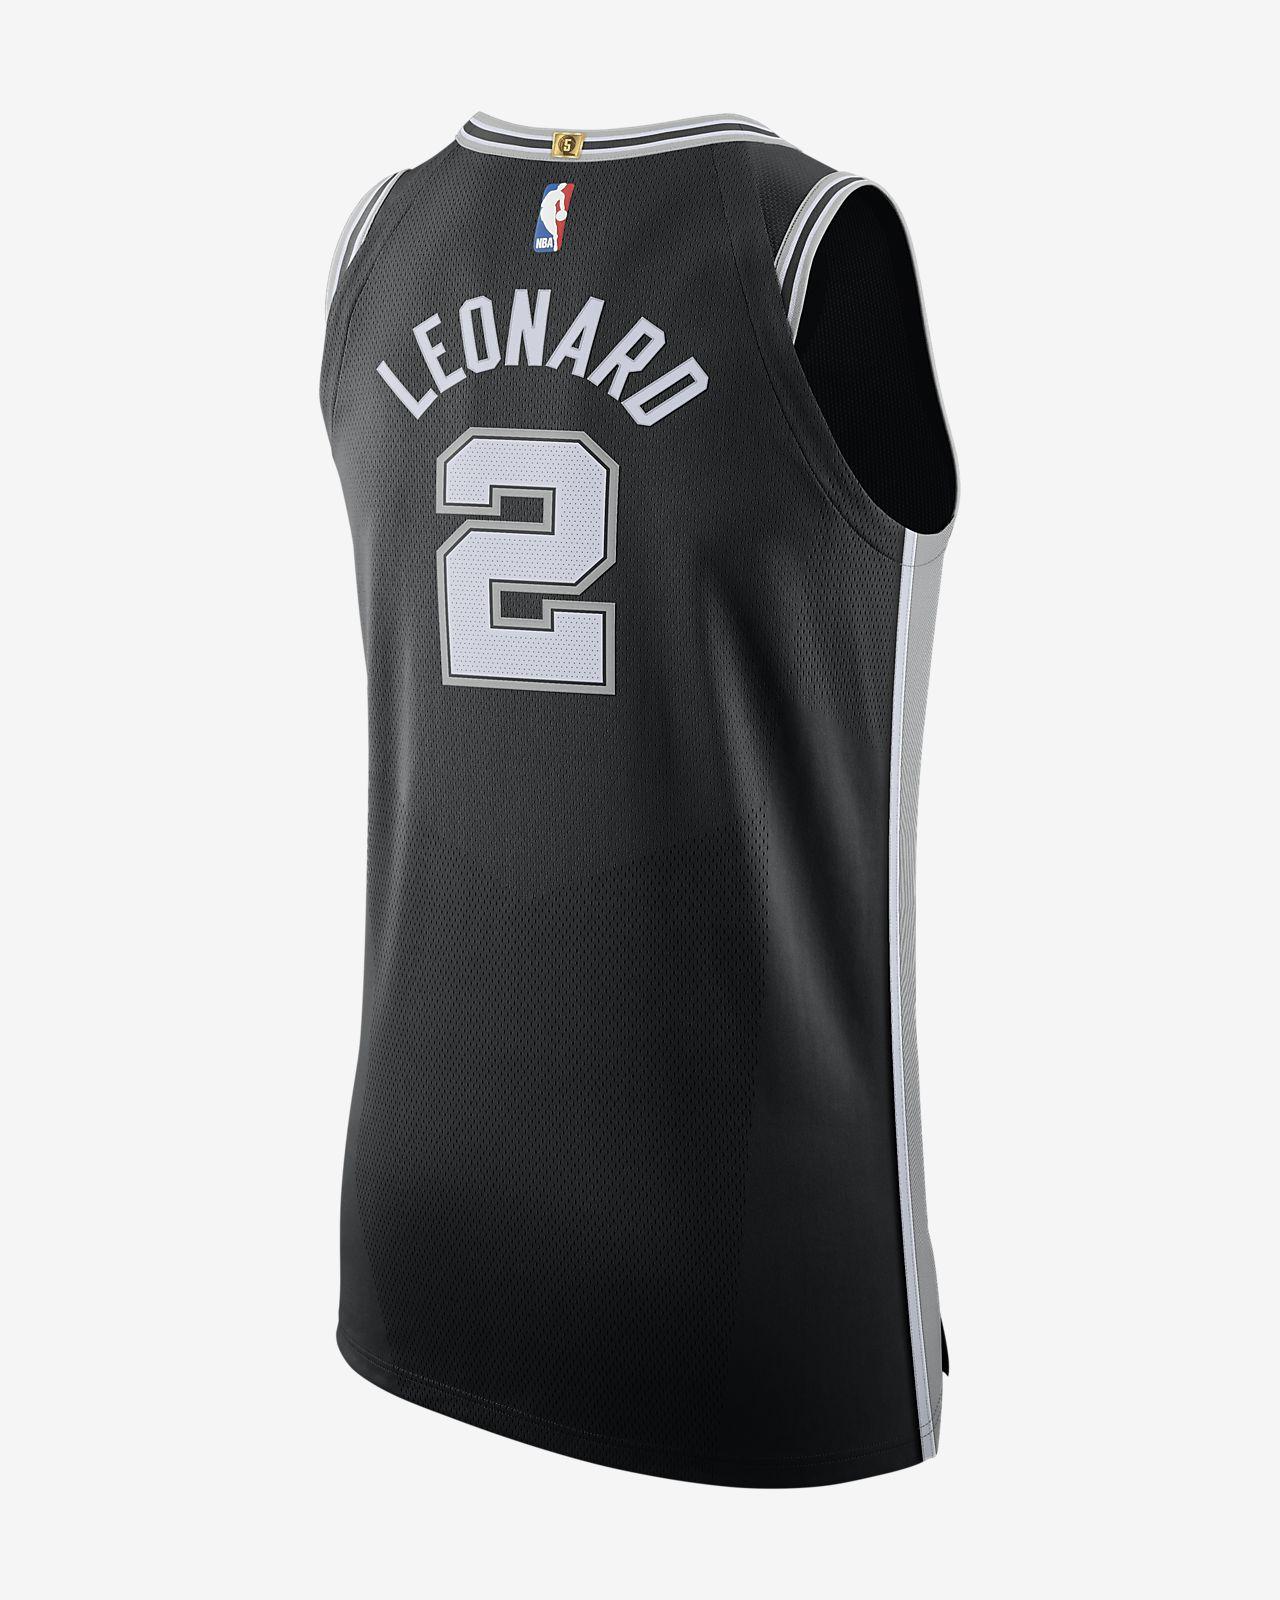 6f478a21e96 ... Kawhi Leonard Icon Edition Authentic (San Antonio Spurs) Men's Nike NBA  Connected Jersey